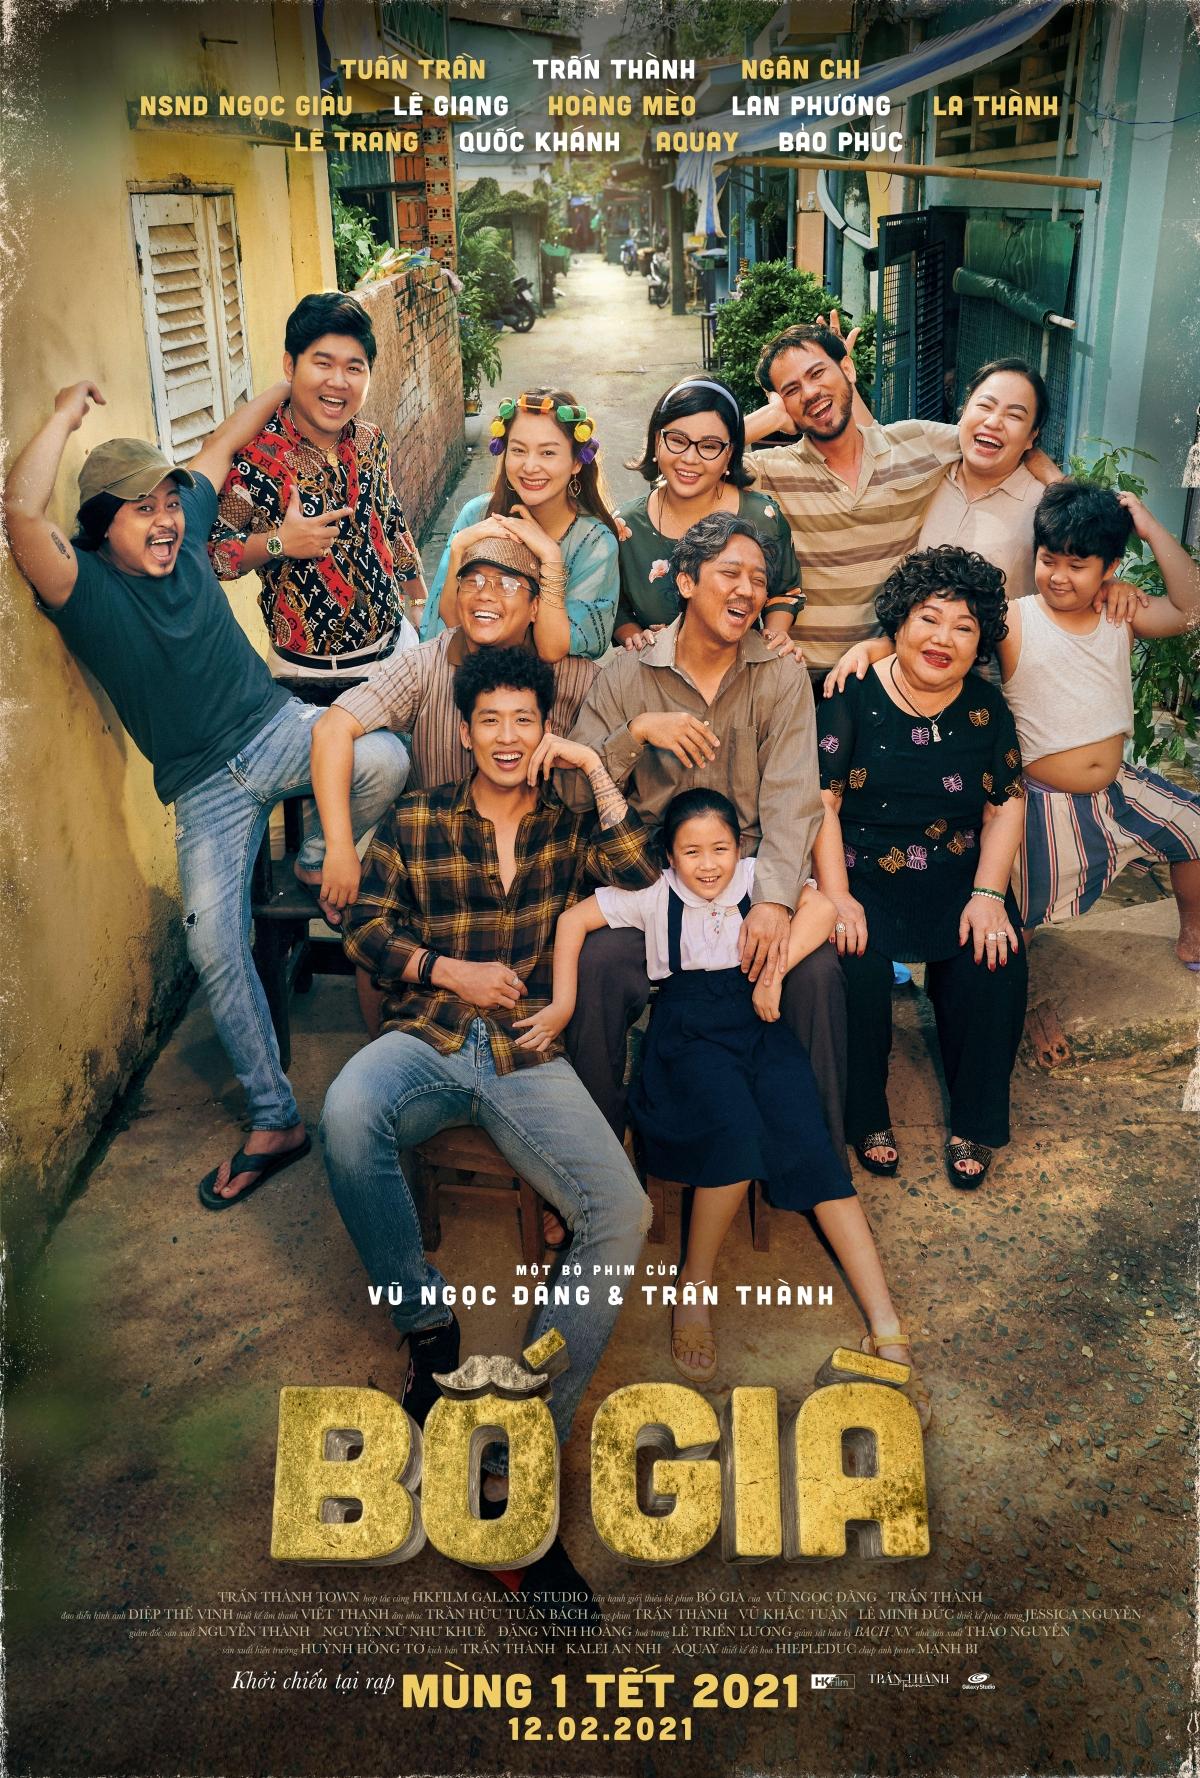 Bo-Gia-phim-2021-chieu-rap-dang-xem-nhat